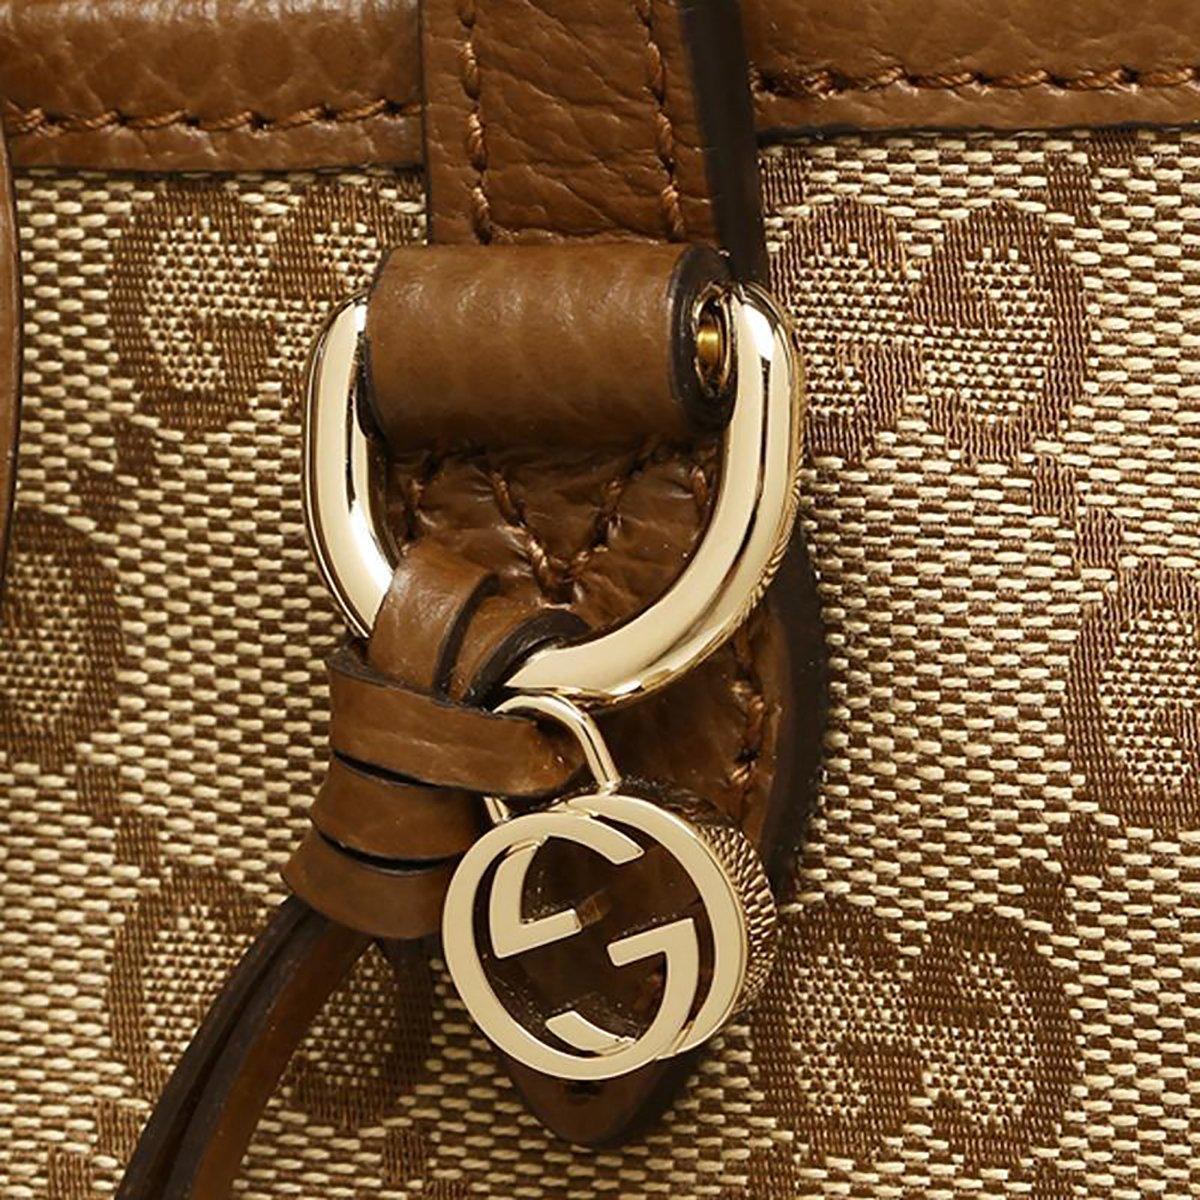 2b3d7267eca243 Gucci Bree Small GG Canvas Tote Bag Nocciola Brown New Bag: Amazon.ca:  Shoes & Handbags